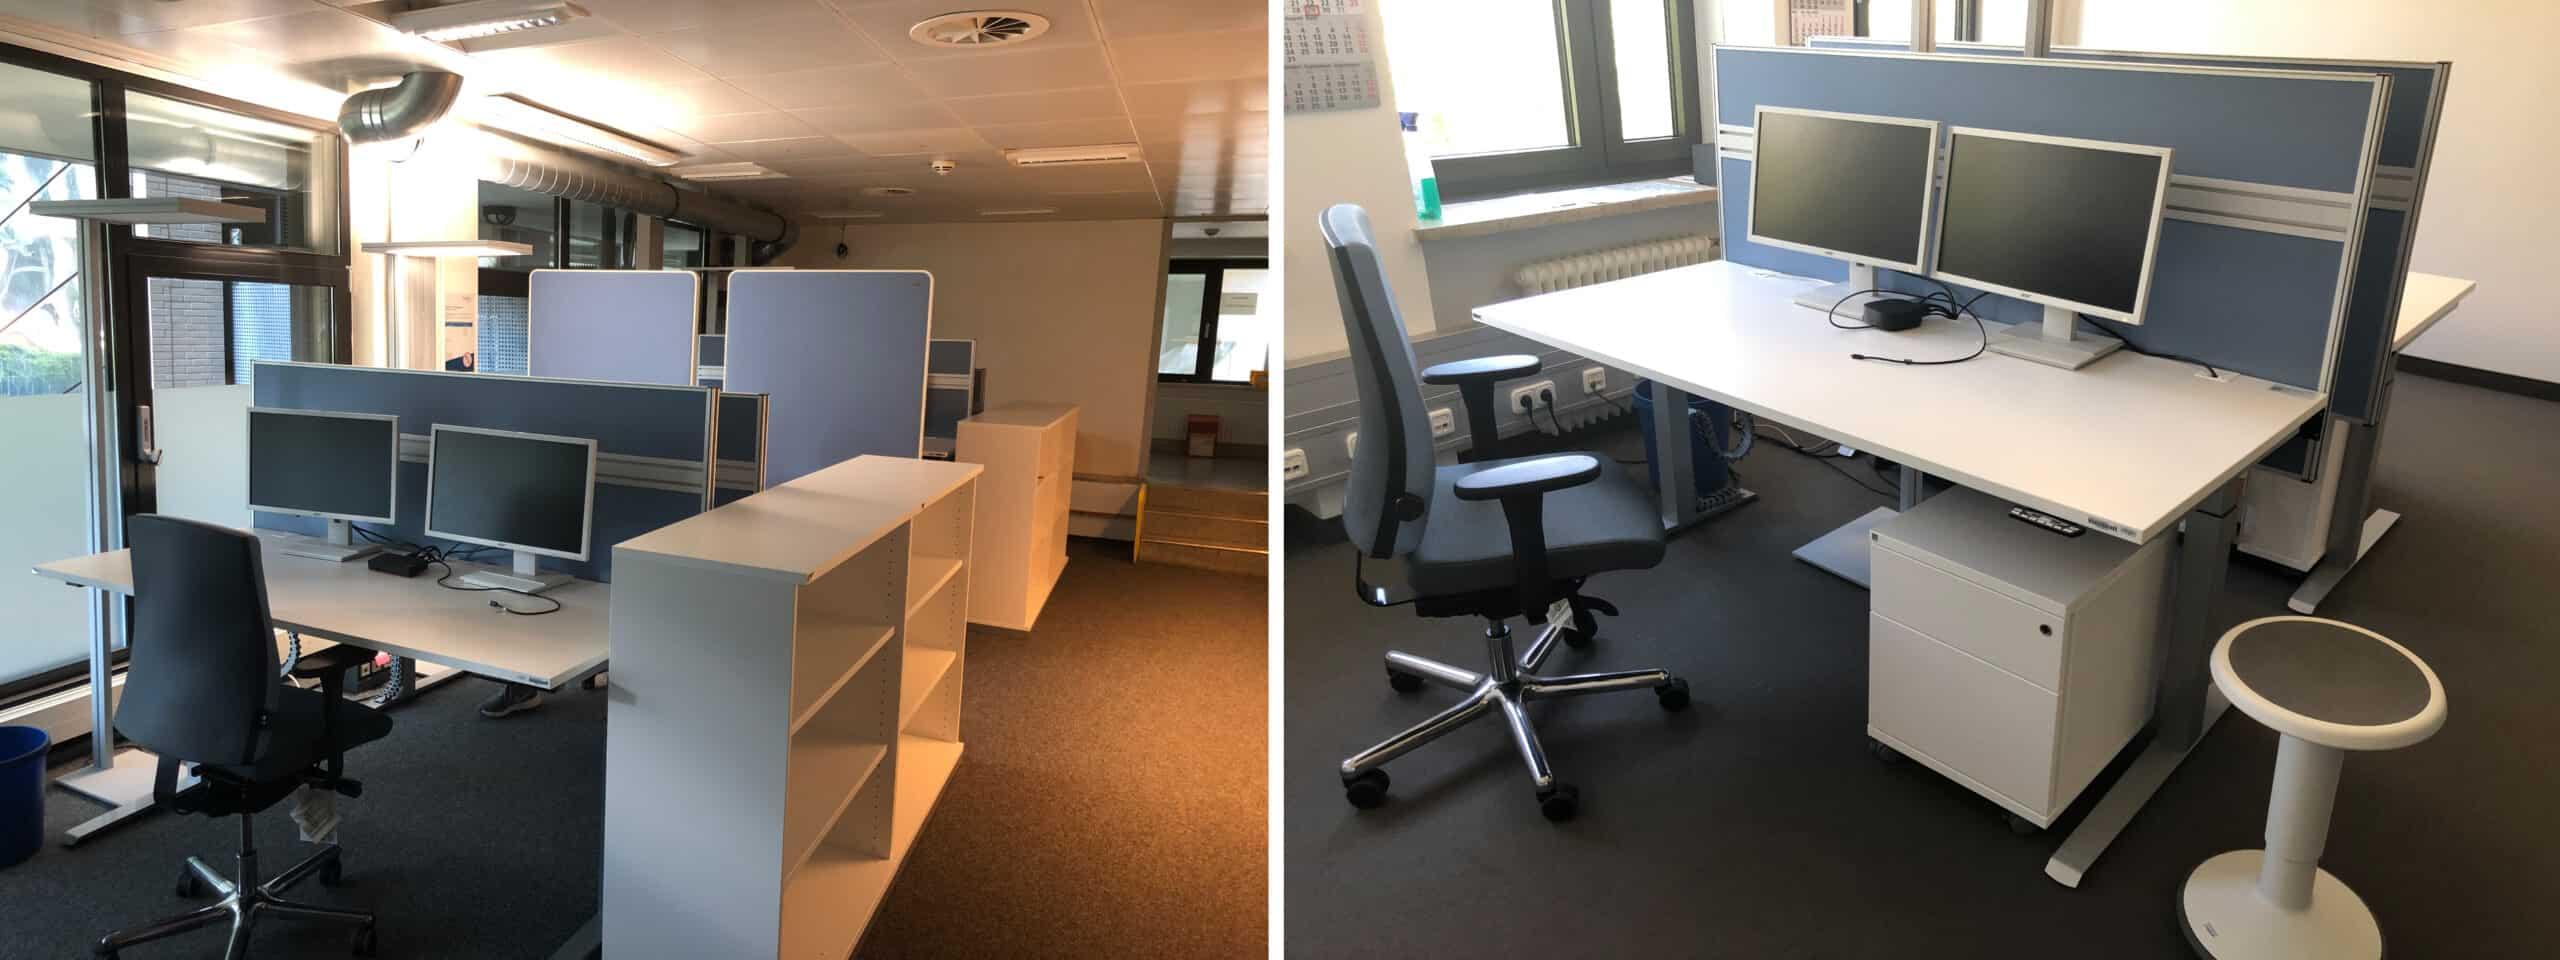 Modernes-Büro-gmsh